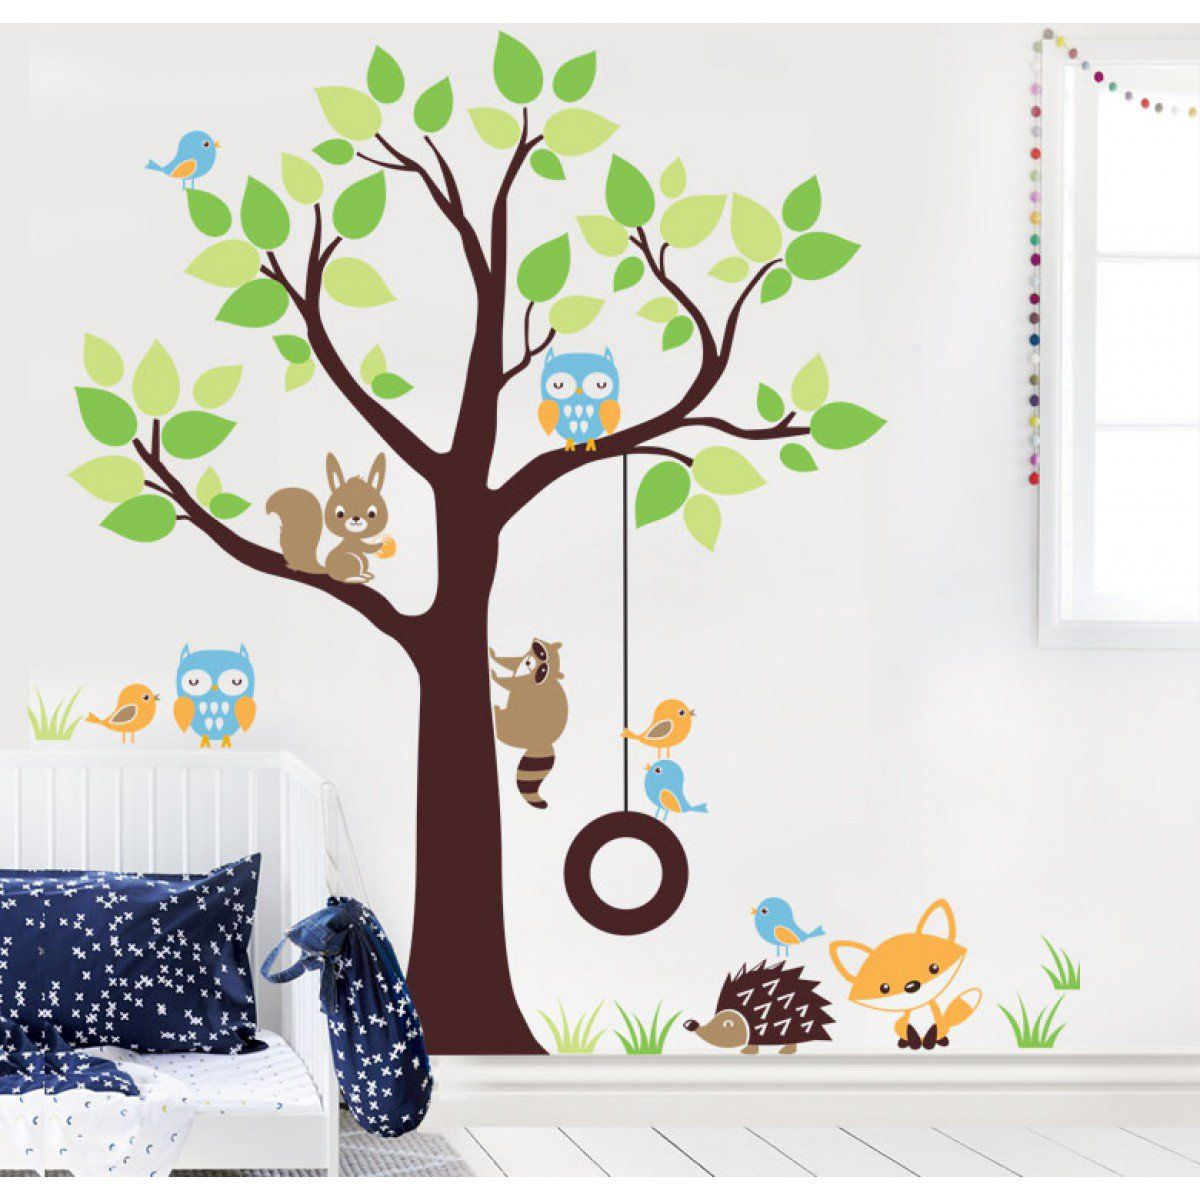 10 carteles infantiles para decorar la habitaci n de los for Vinilos infantiles ikea